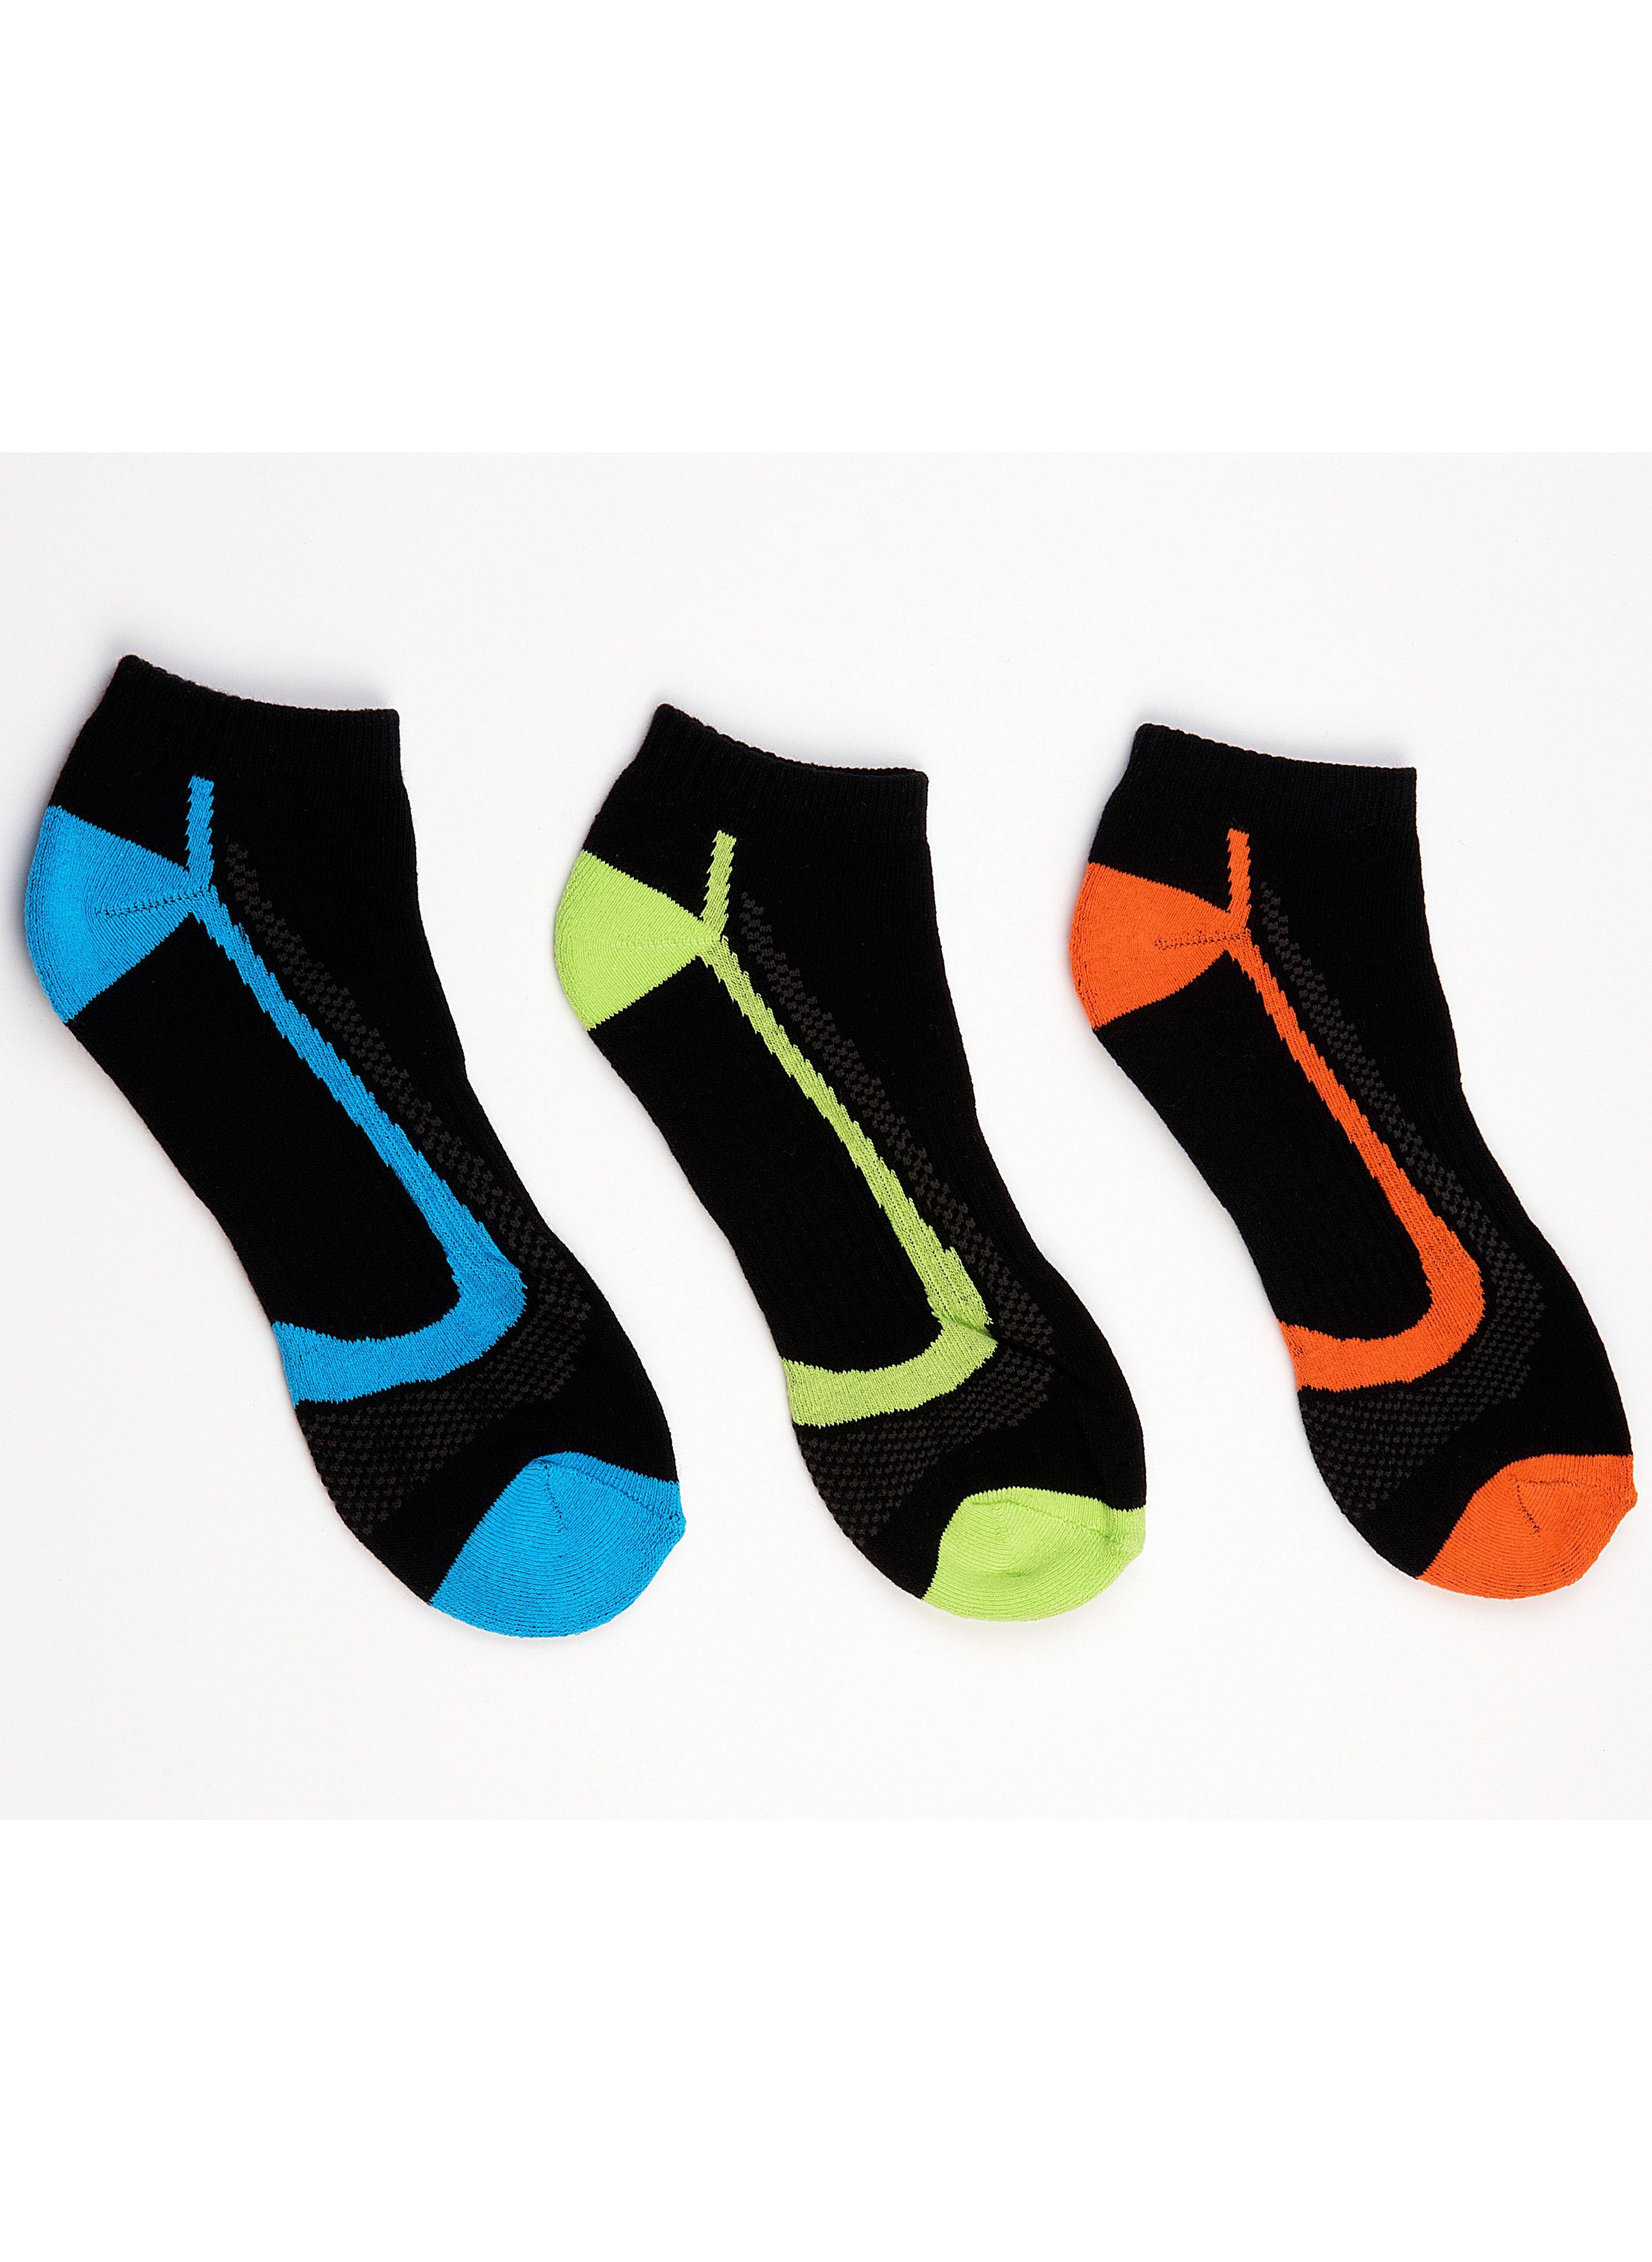 Sport-Sneakers, Zonenverstärkt, 3 Stück